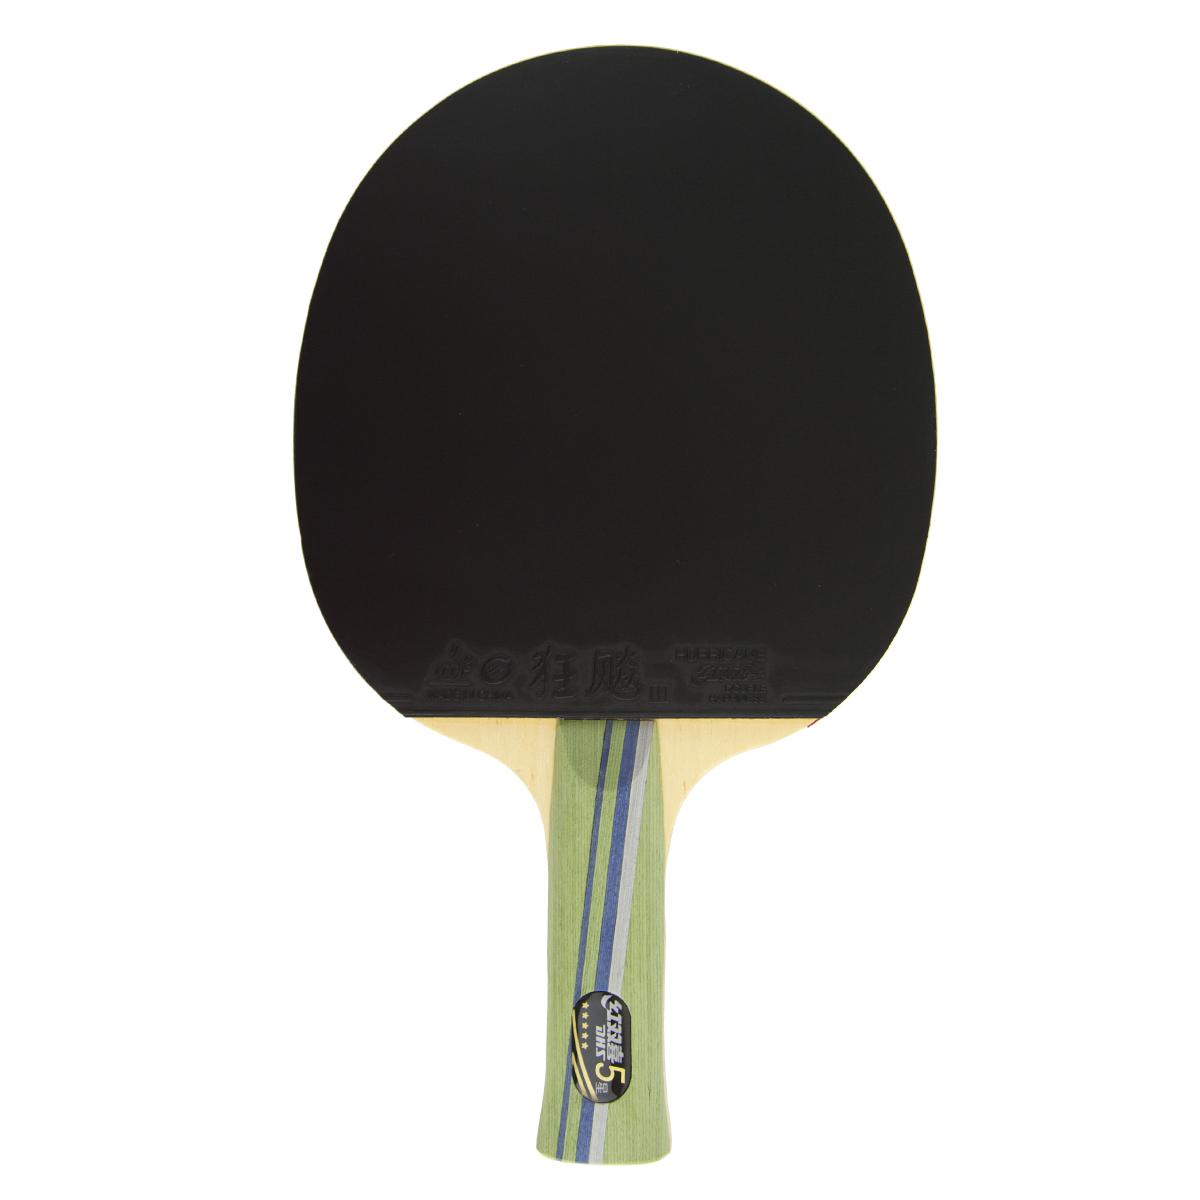 Pálka na stolní tenis DOUBLE HAPPINES 5003